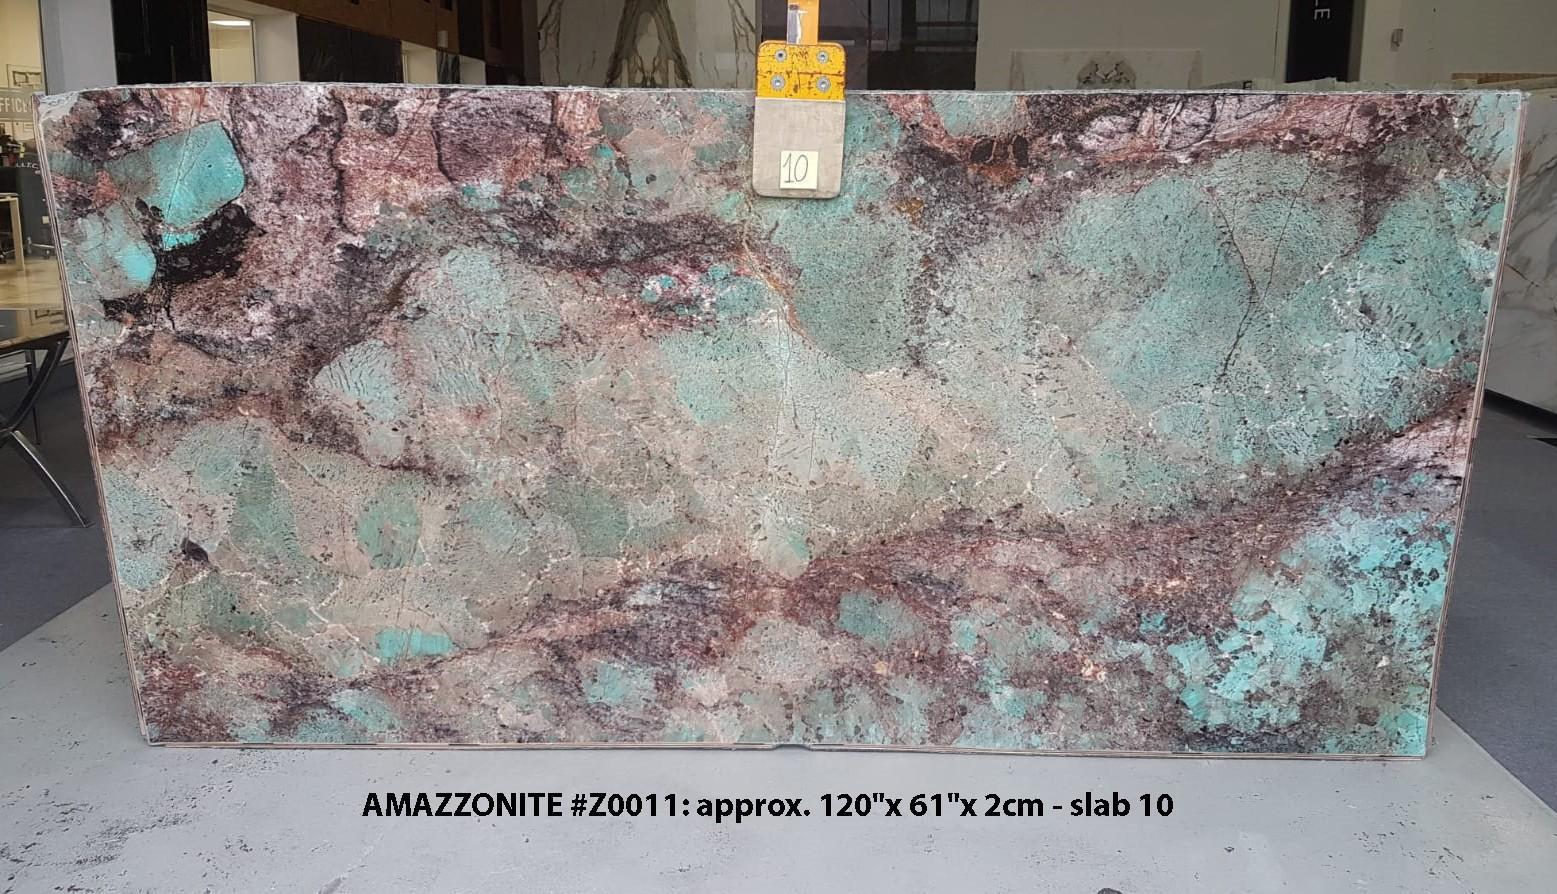 AMAZZONITE Supply Veneto (Italy) polished slabs Z0011 , Slab #10 natural semi precious stone